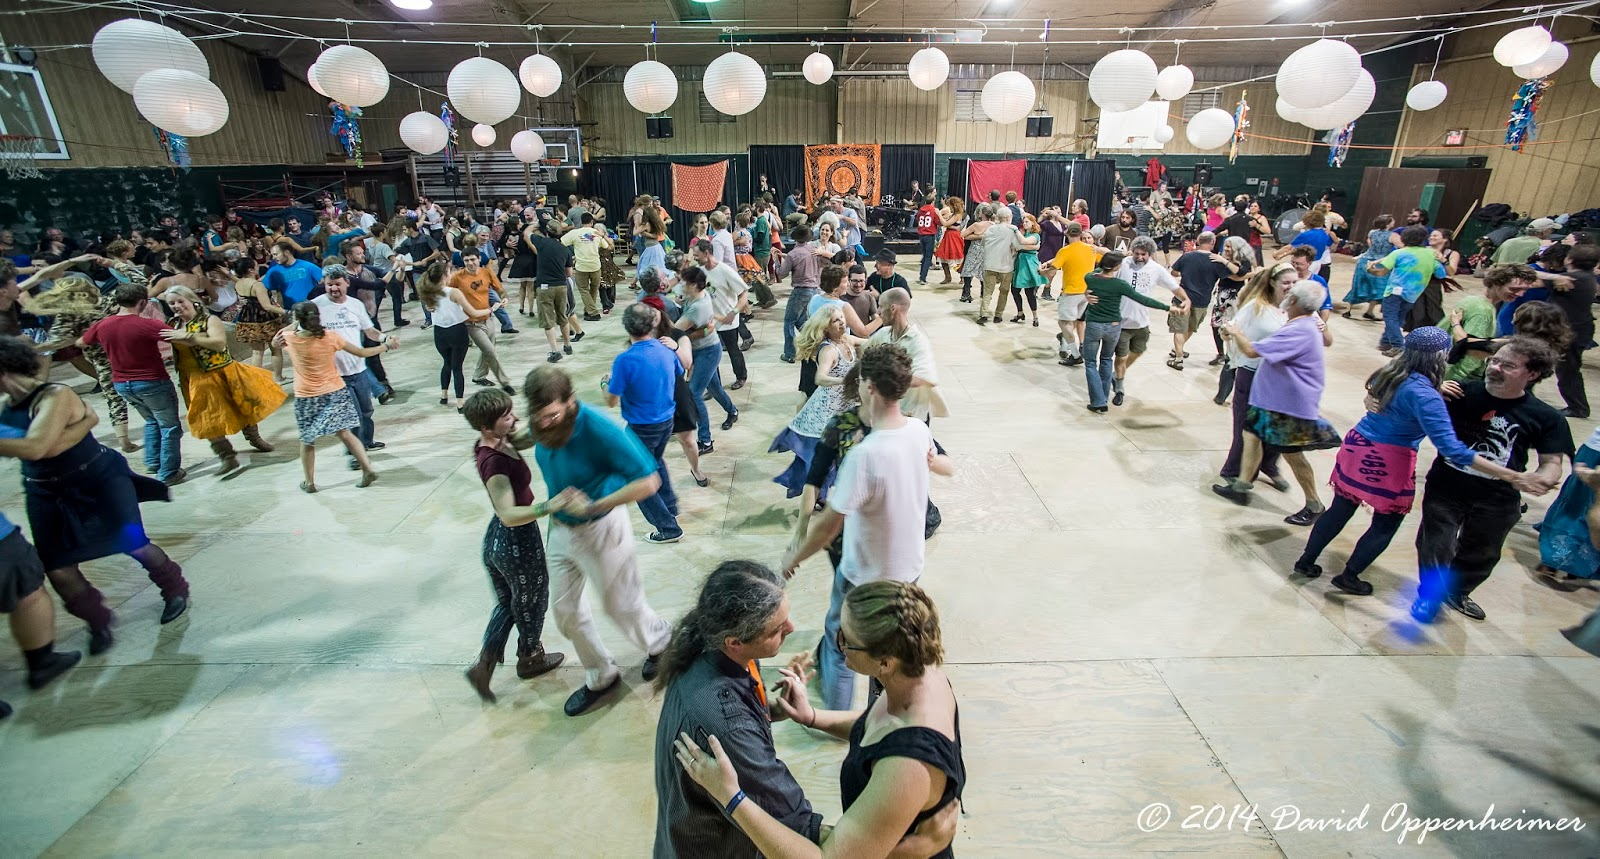 Contra dancing at LEAF Festival